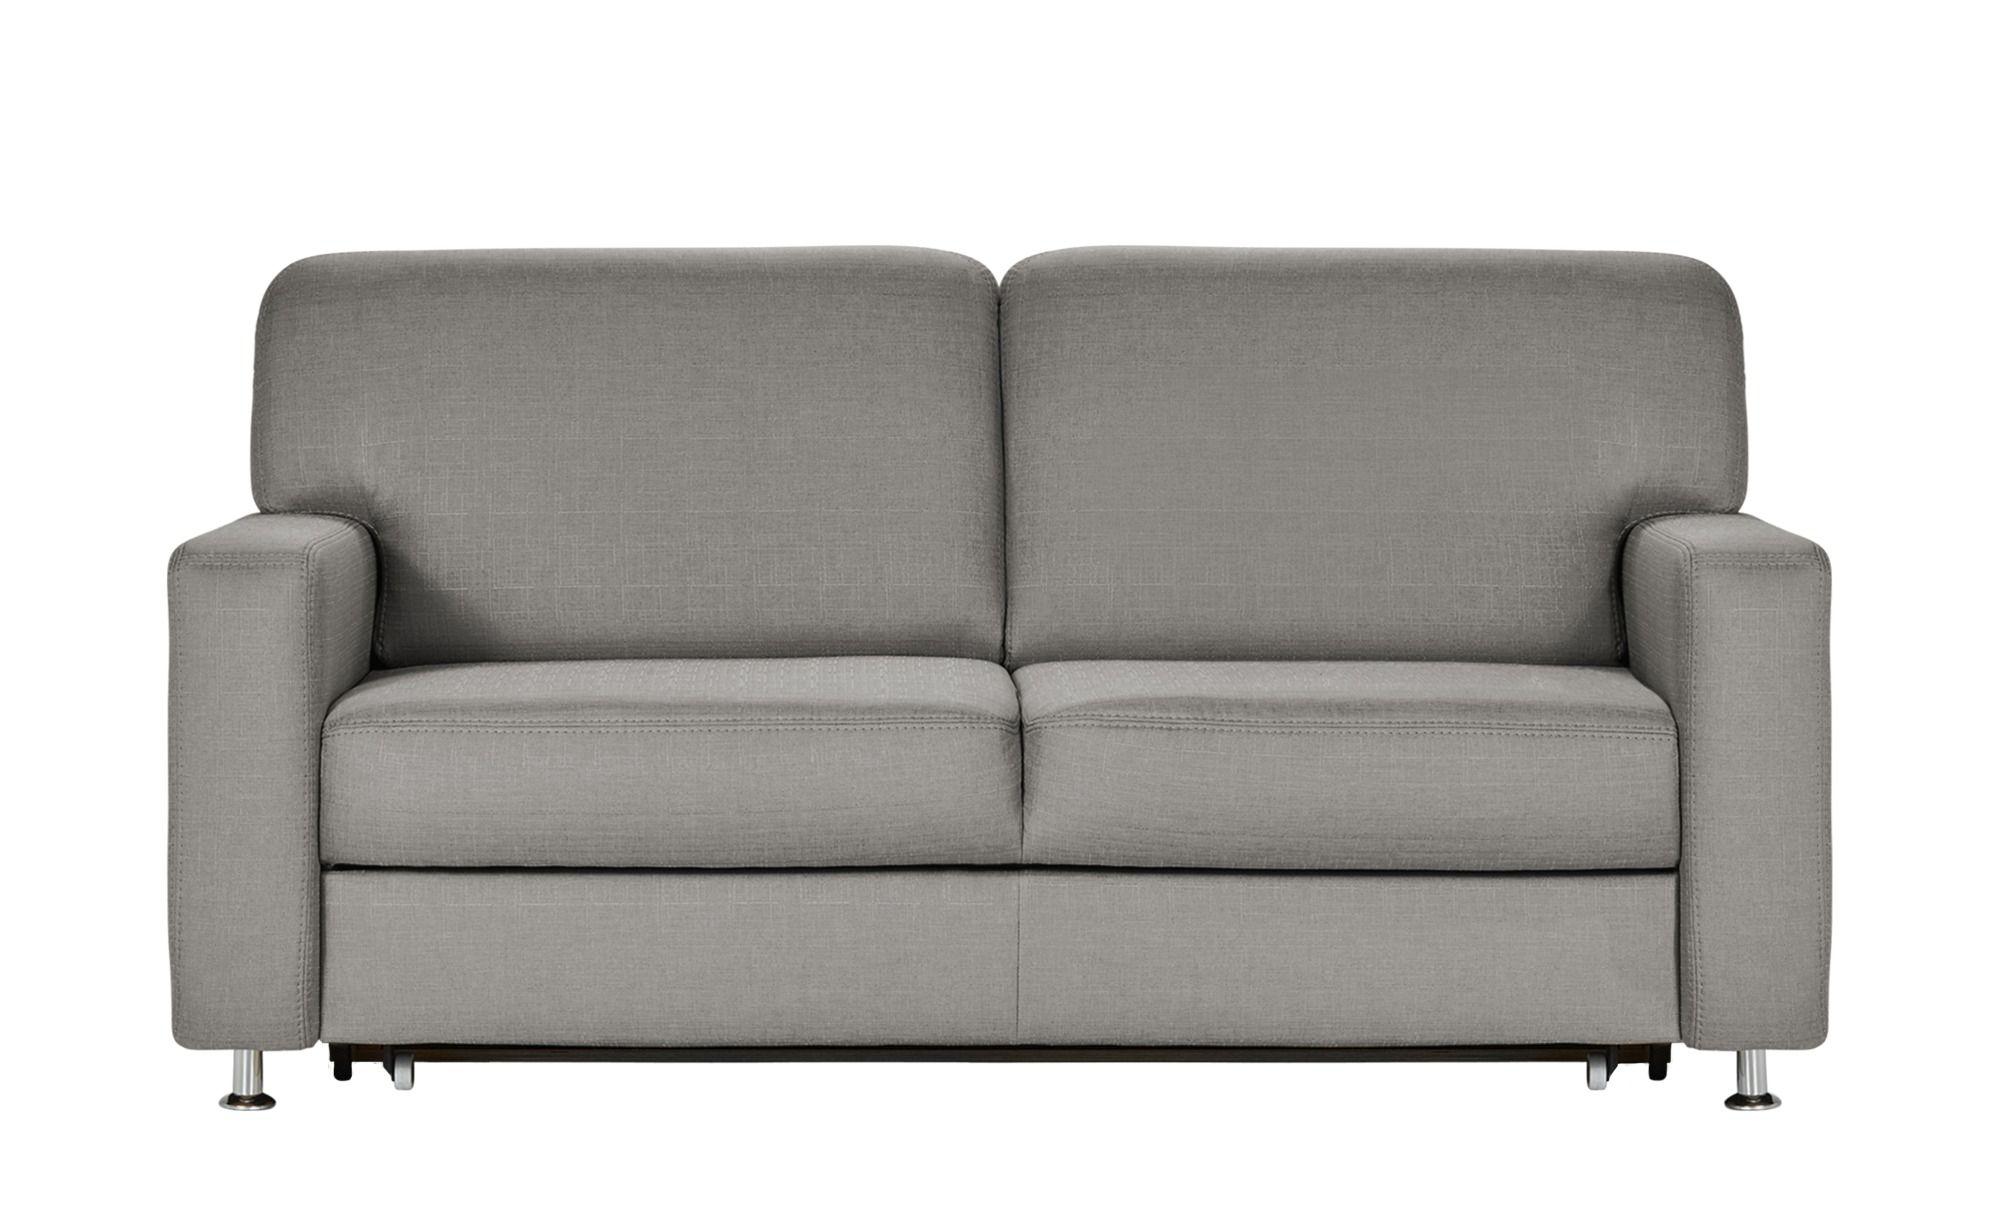 Smart Sofa Grau Braun Flachgewebe Valencia Big Sofa Kaufen Sofa Leder Sofa